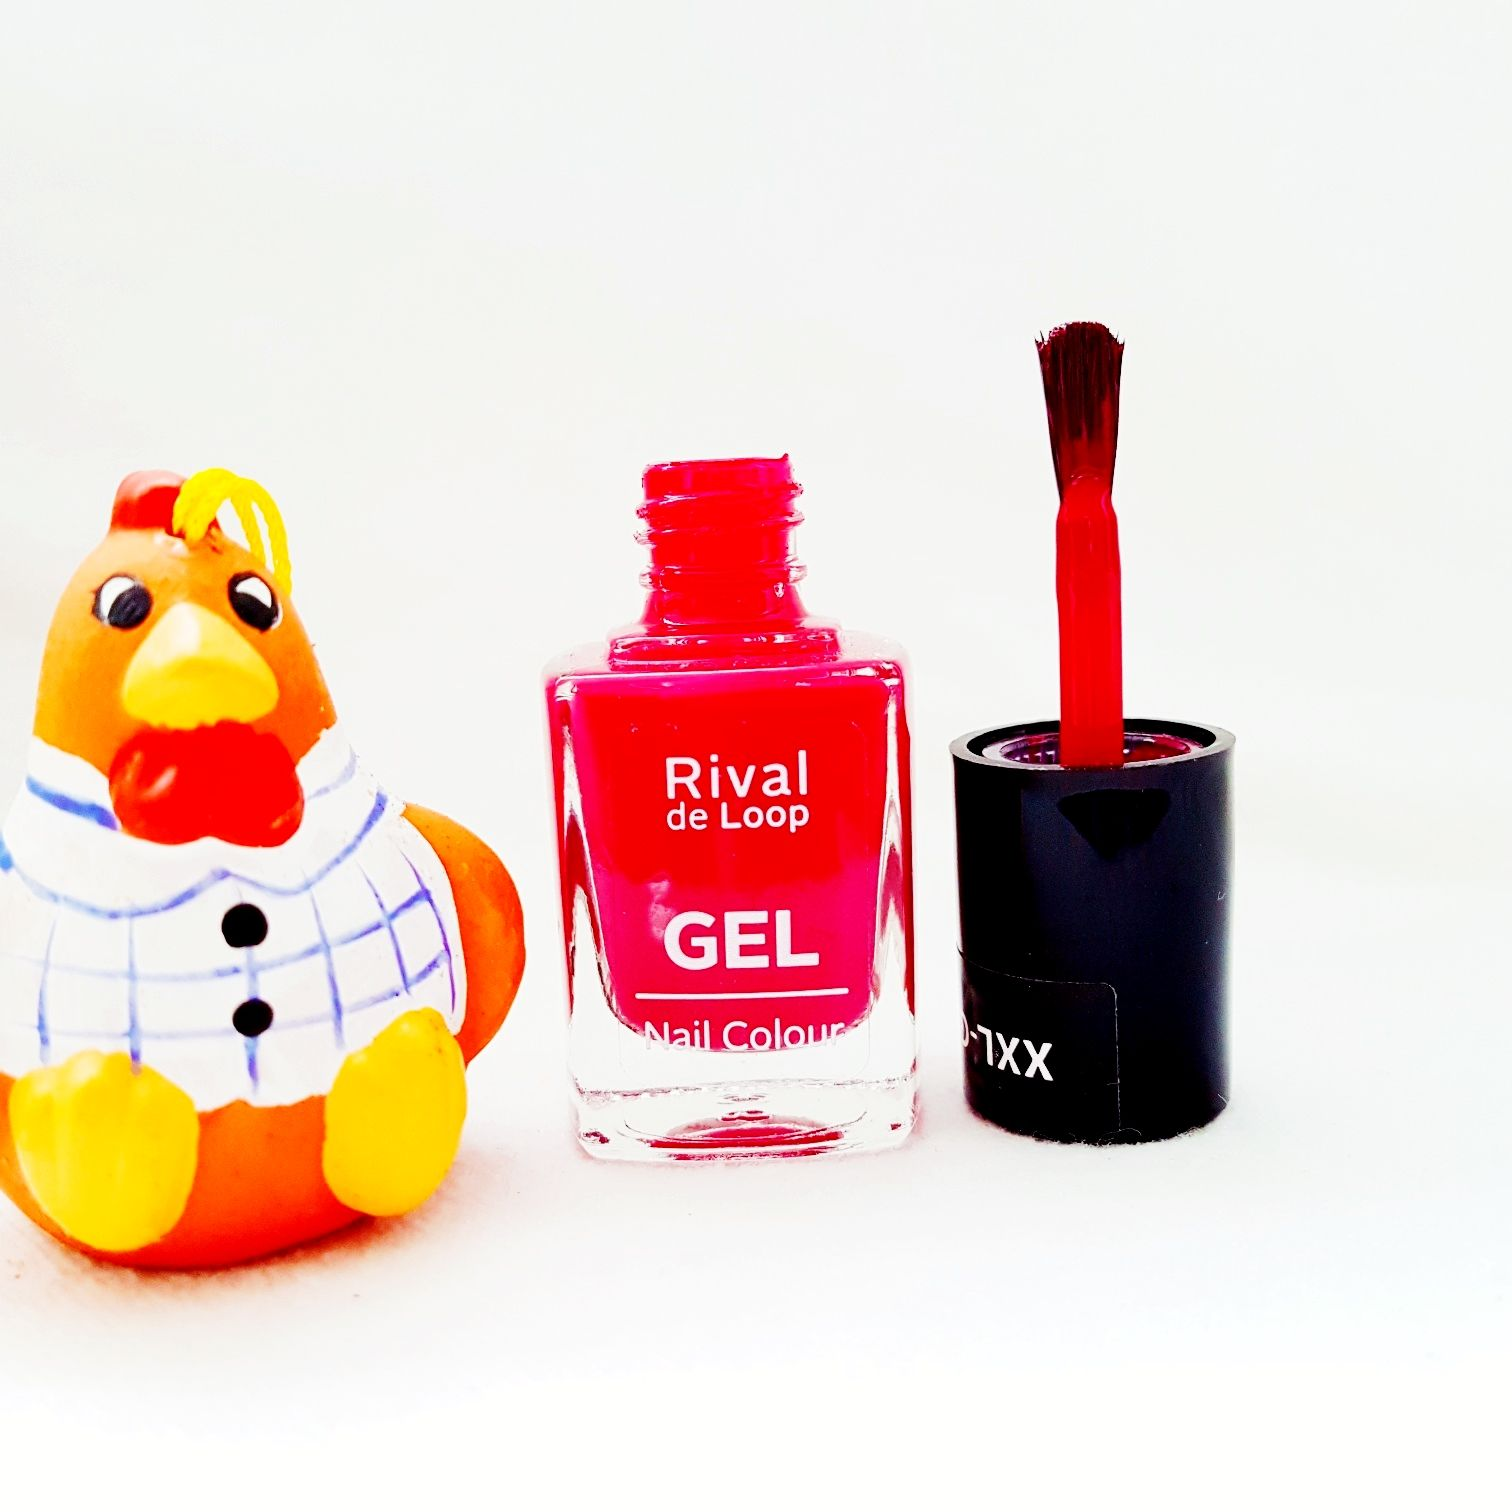 Rival de Loop Gel Nail Colour mit xxl - Glanz